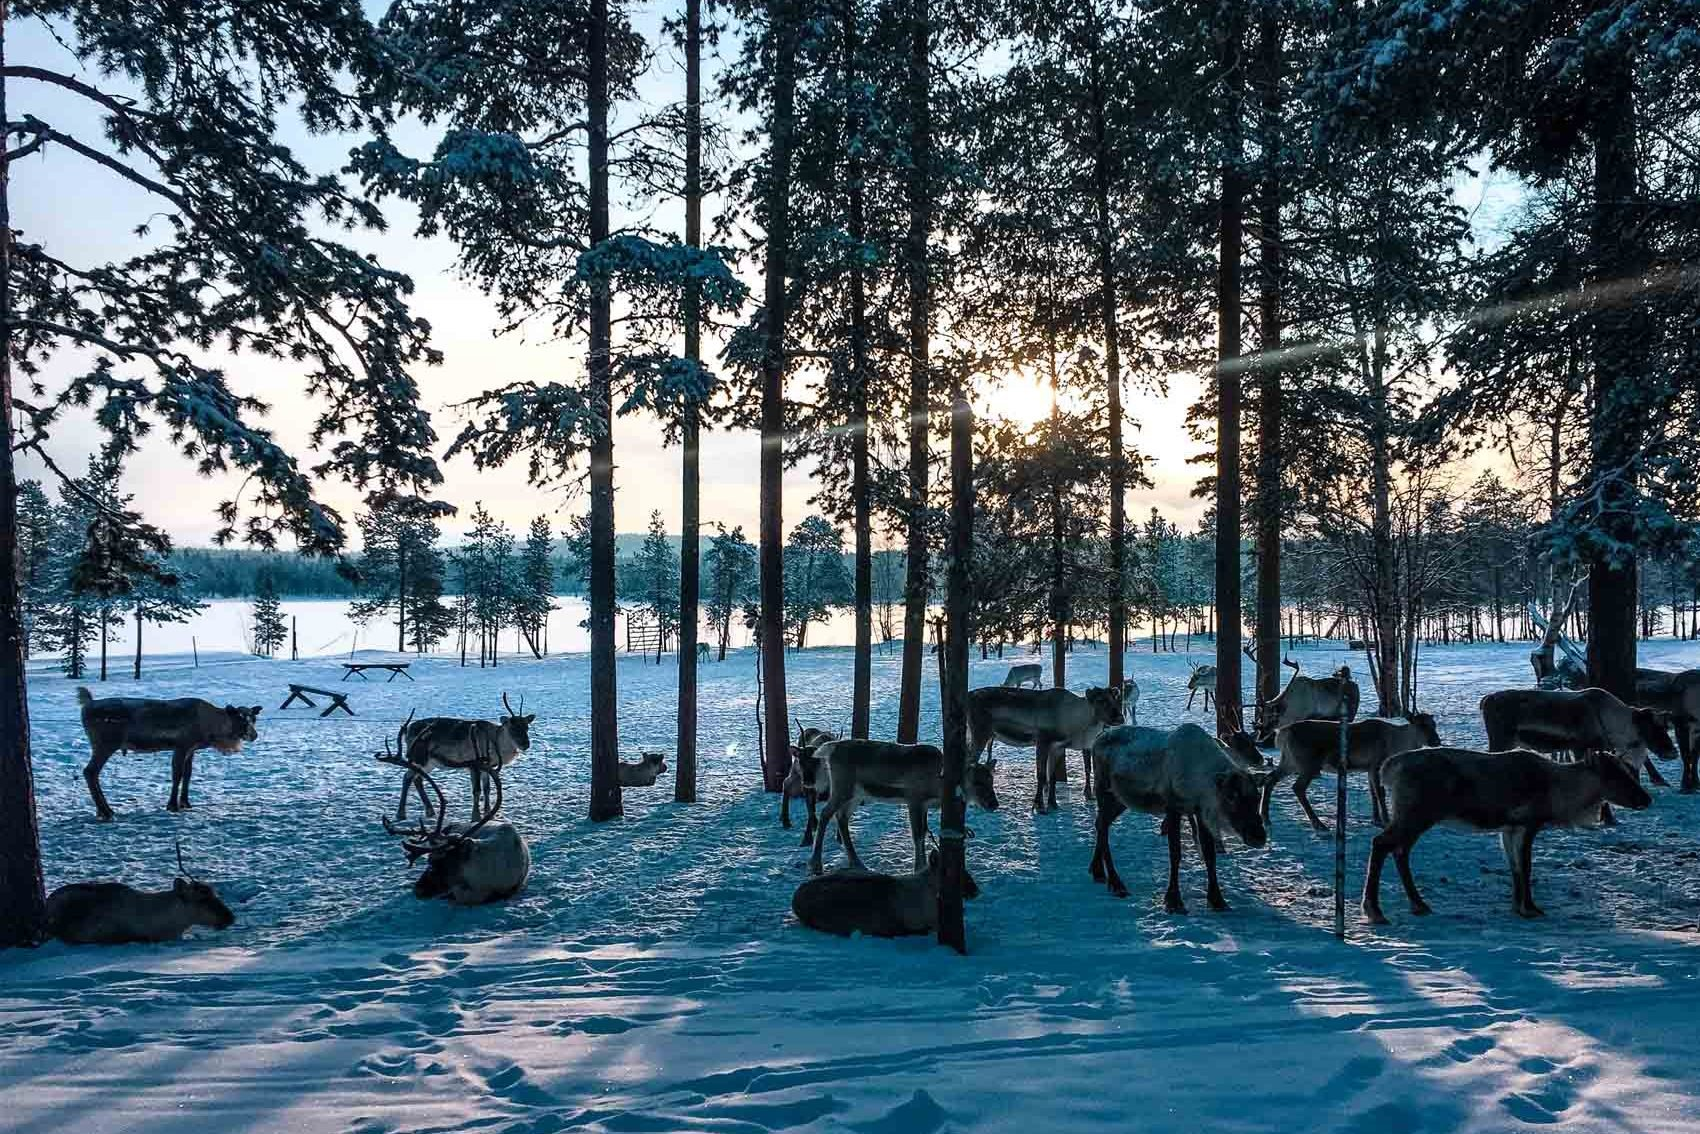 reindeer farm in finnish lapand in winter - bucket list travel